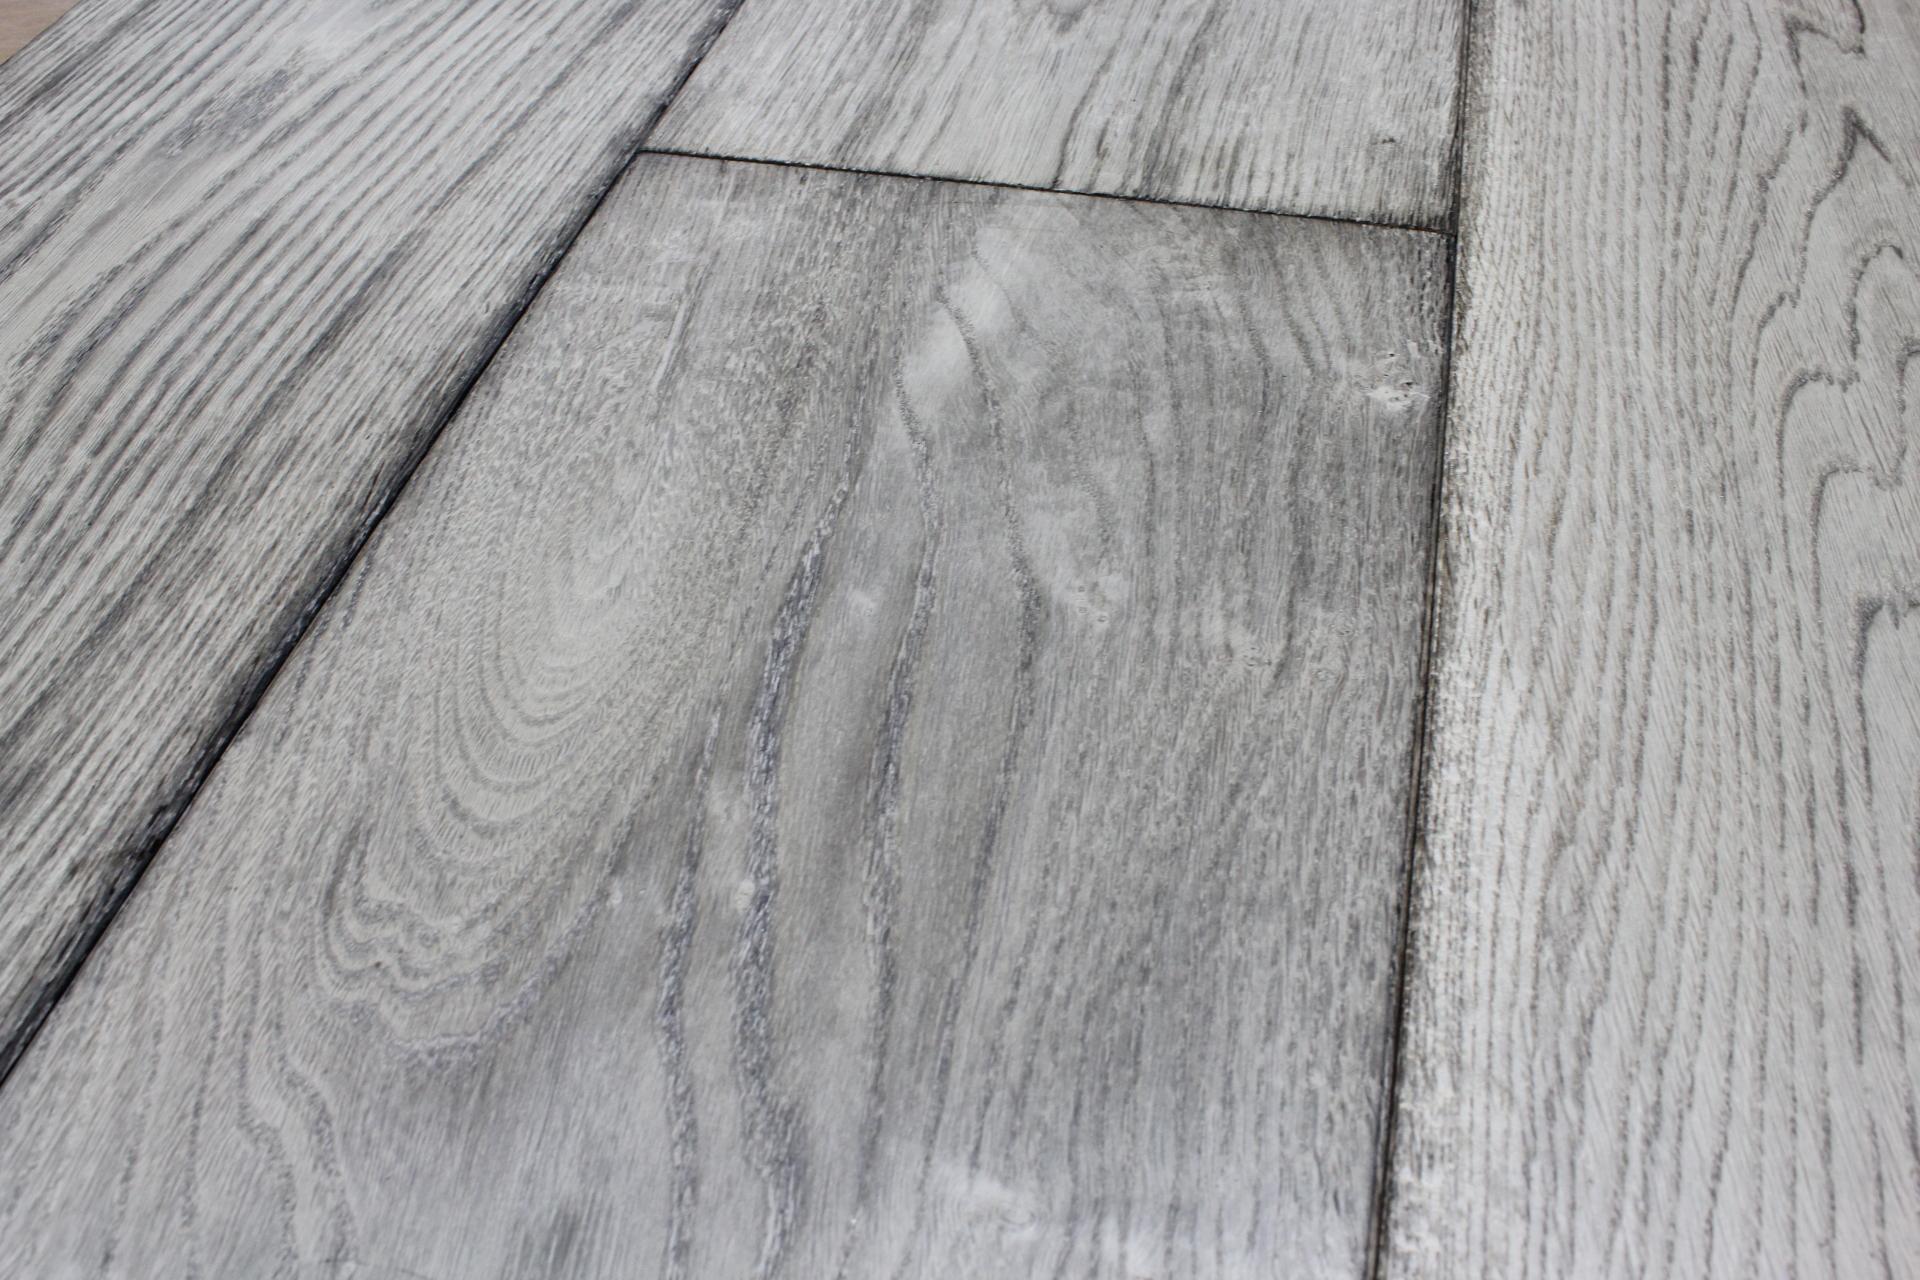 Hardwood, prefinished floor, engineered wood, solid wood, lifestyle, hard surface, prefinished hardwood, prefinished wood, home, design, interior design, wood floor design, du chateau